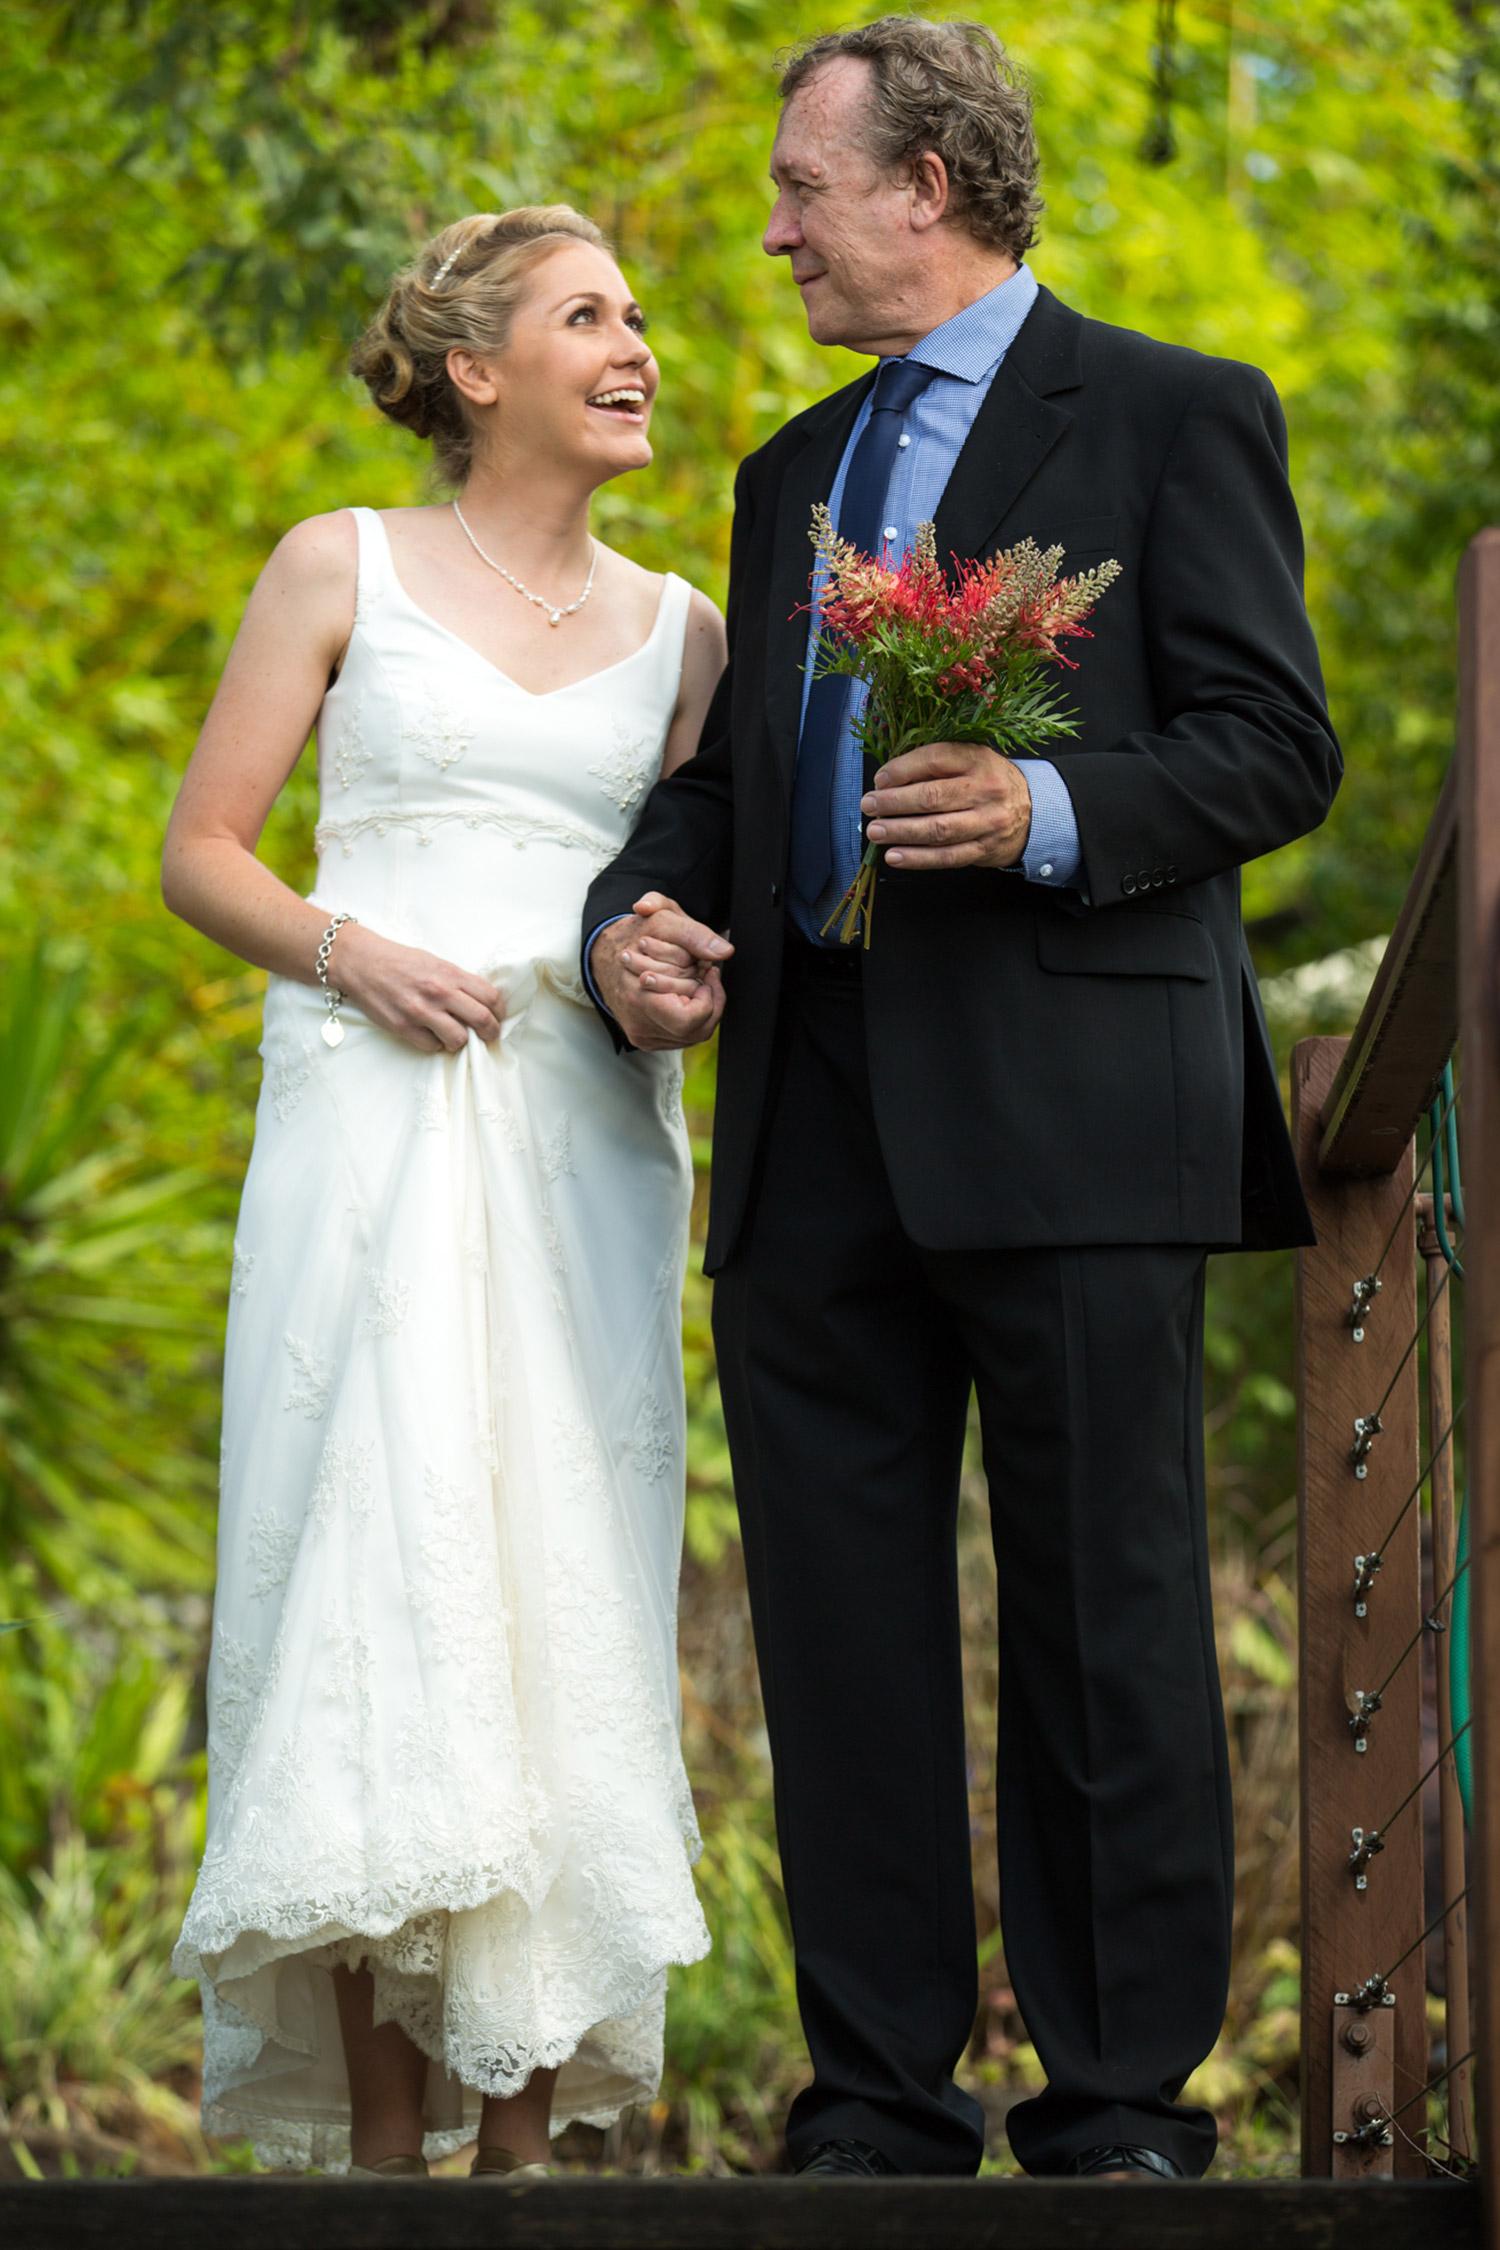 23-sunshine-coast-wedding-photography-all-the-love-in-the-world-noosa-mooloolaba-glasshouse-brisbane-katie-ryan5098.jpg